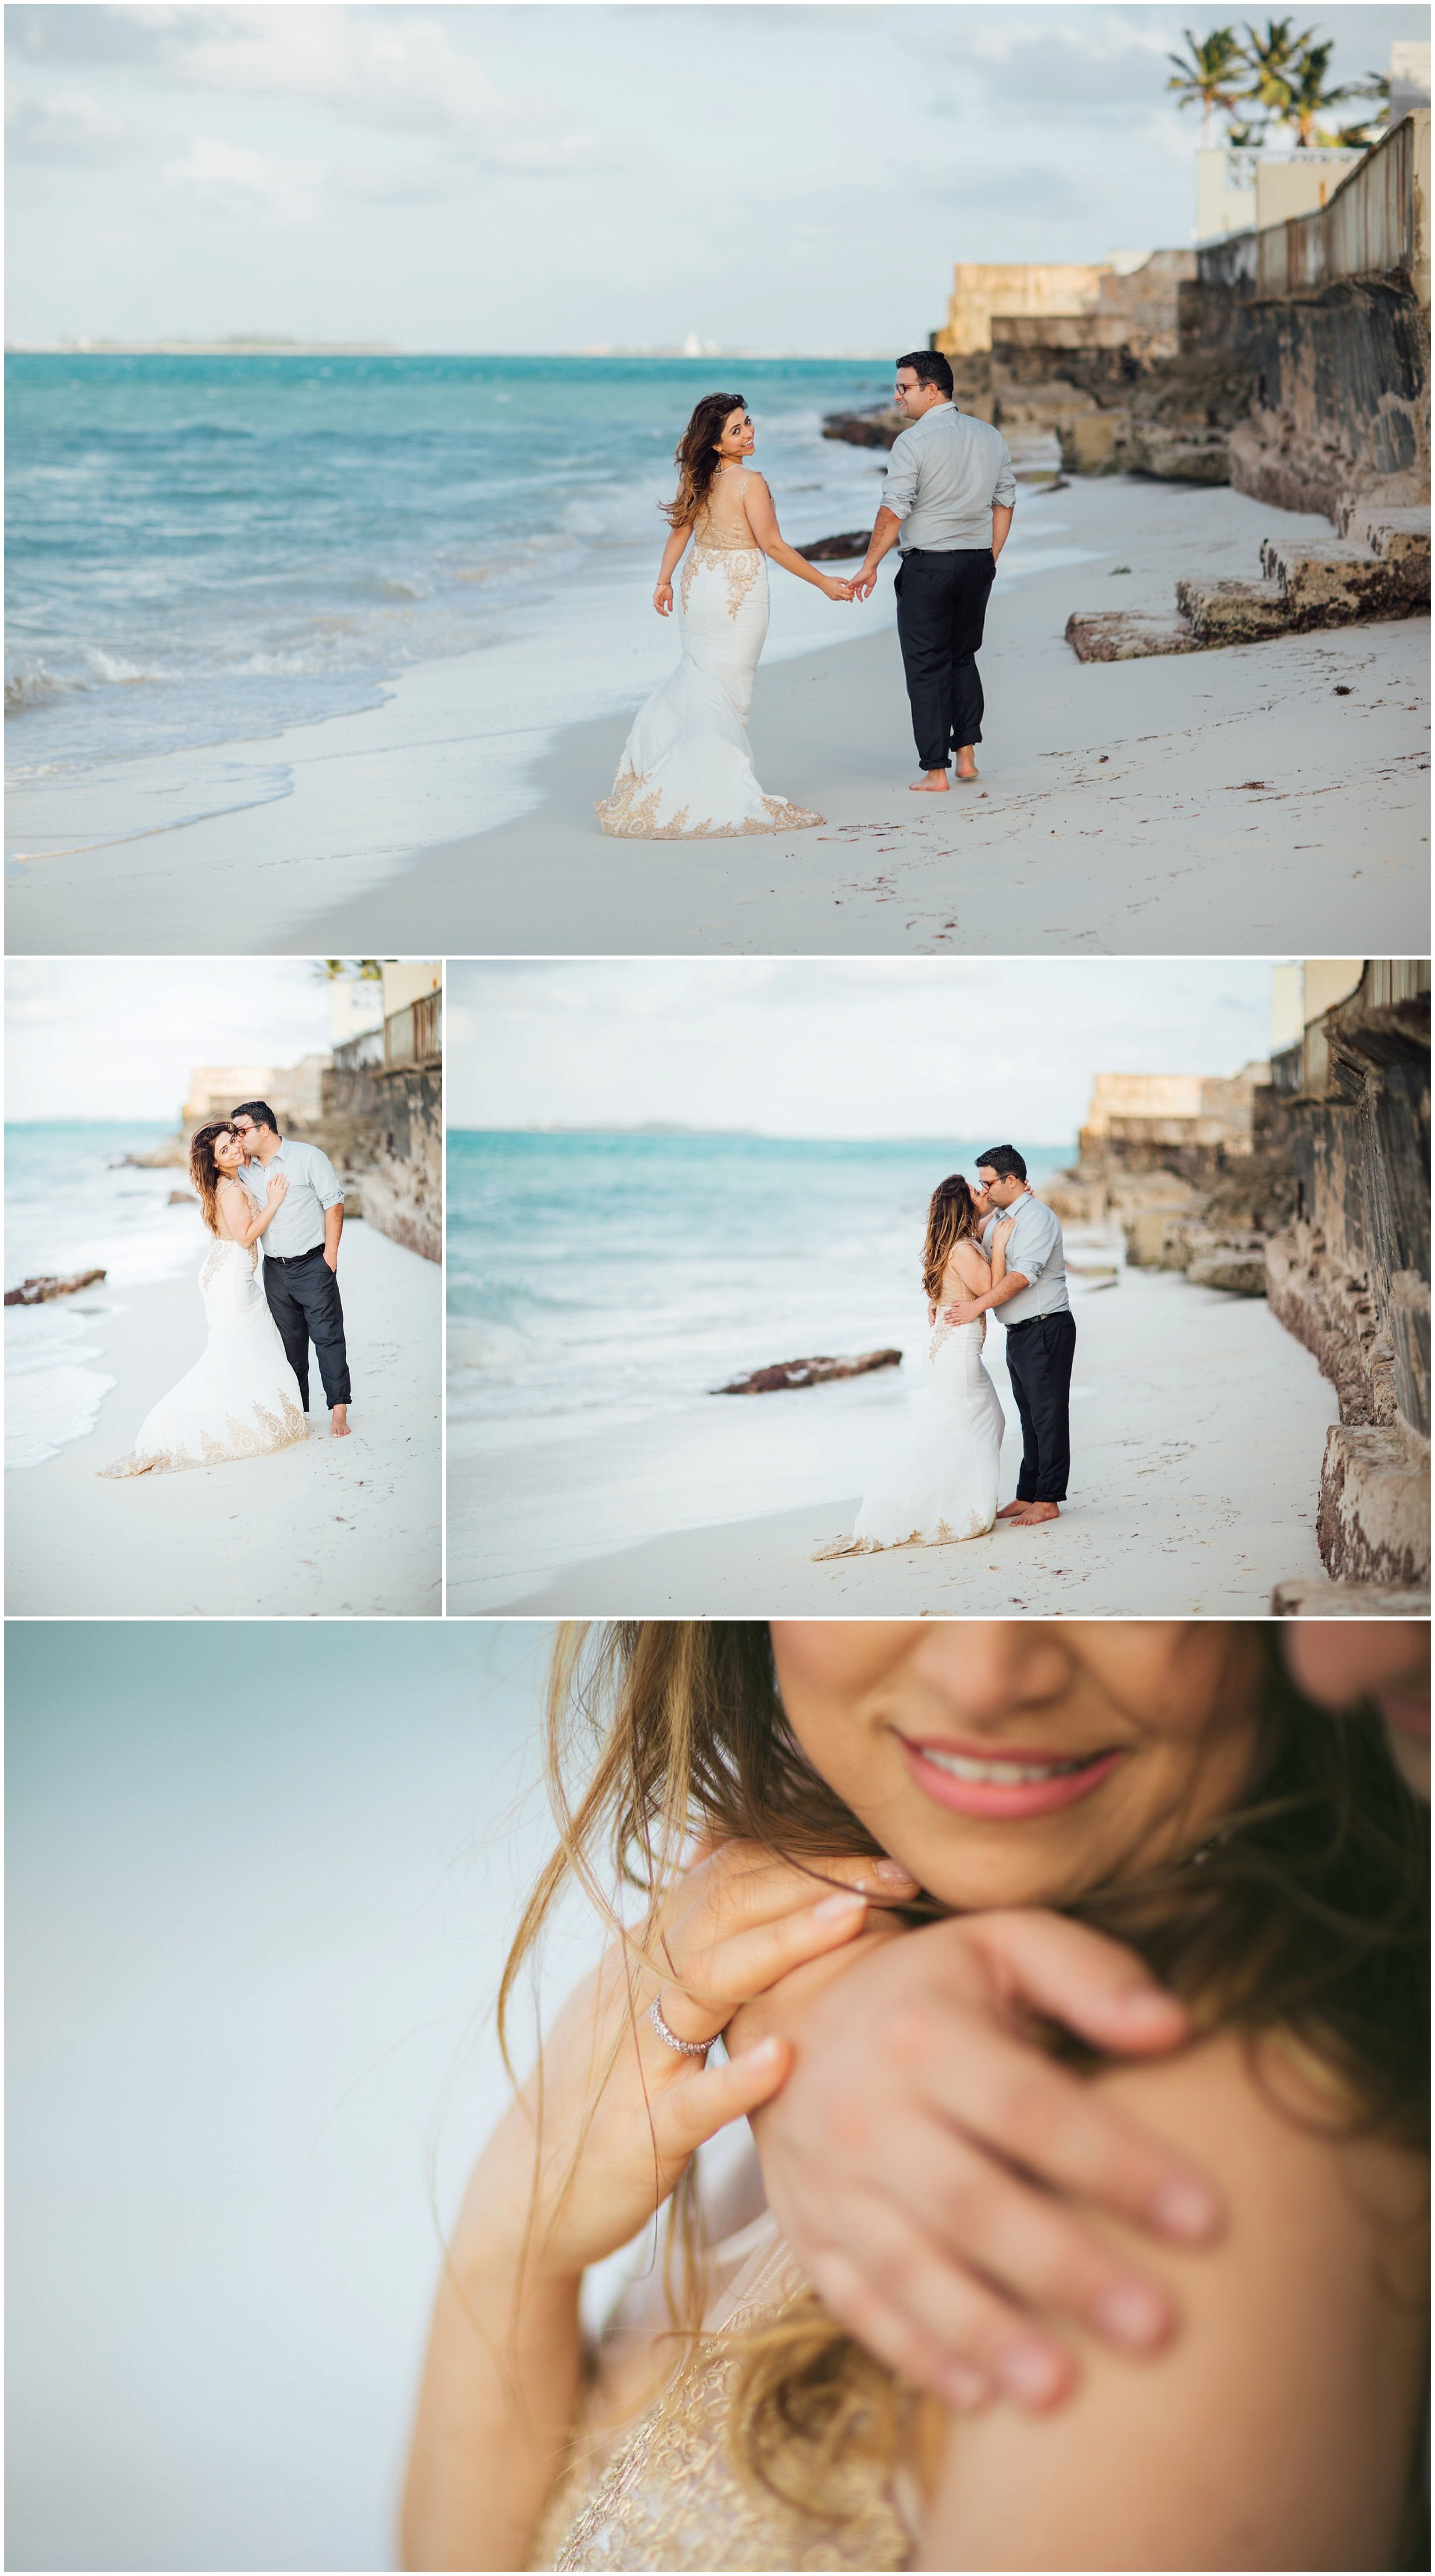 Le Cape Weddings- Destination Wedding Photography -ShayanandNikkie-16-X3_LuxuryDestinationPhotographer.jpg